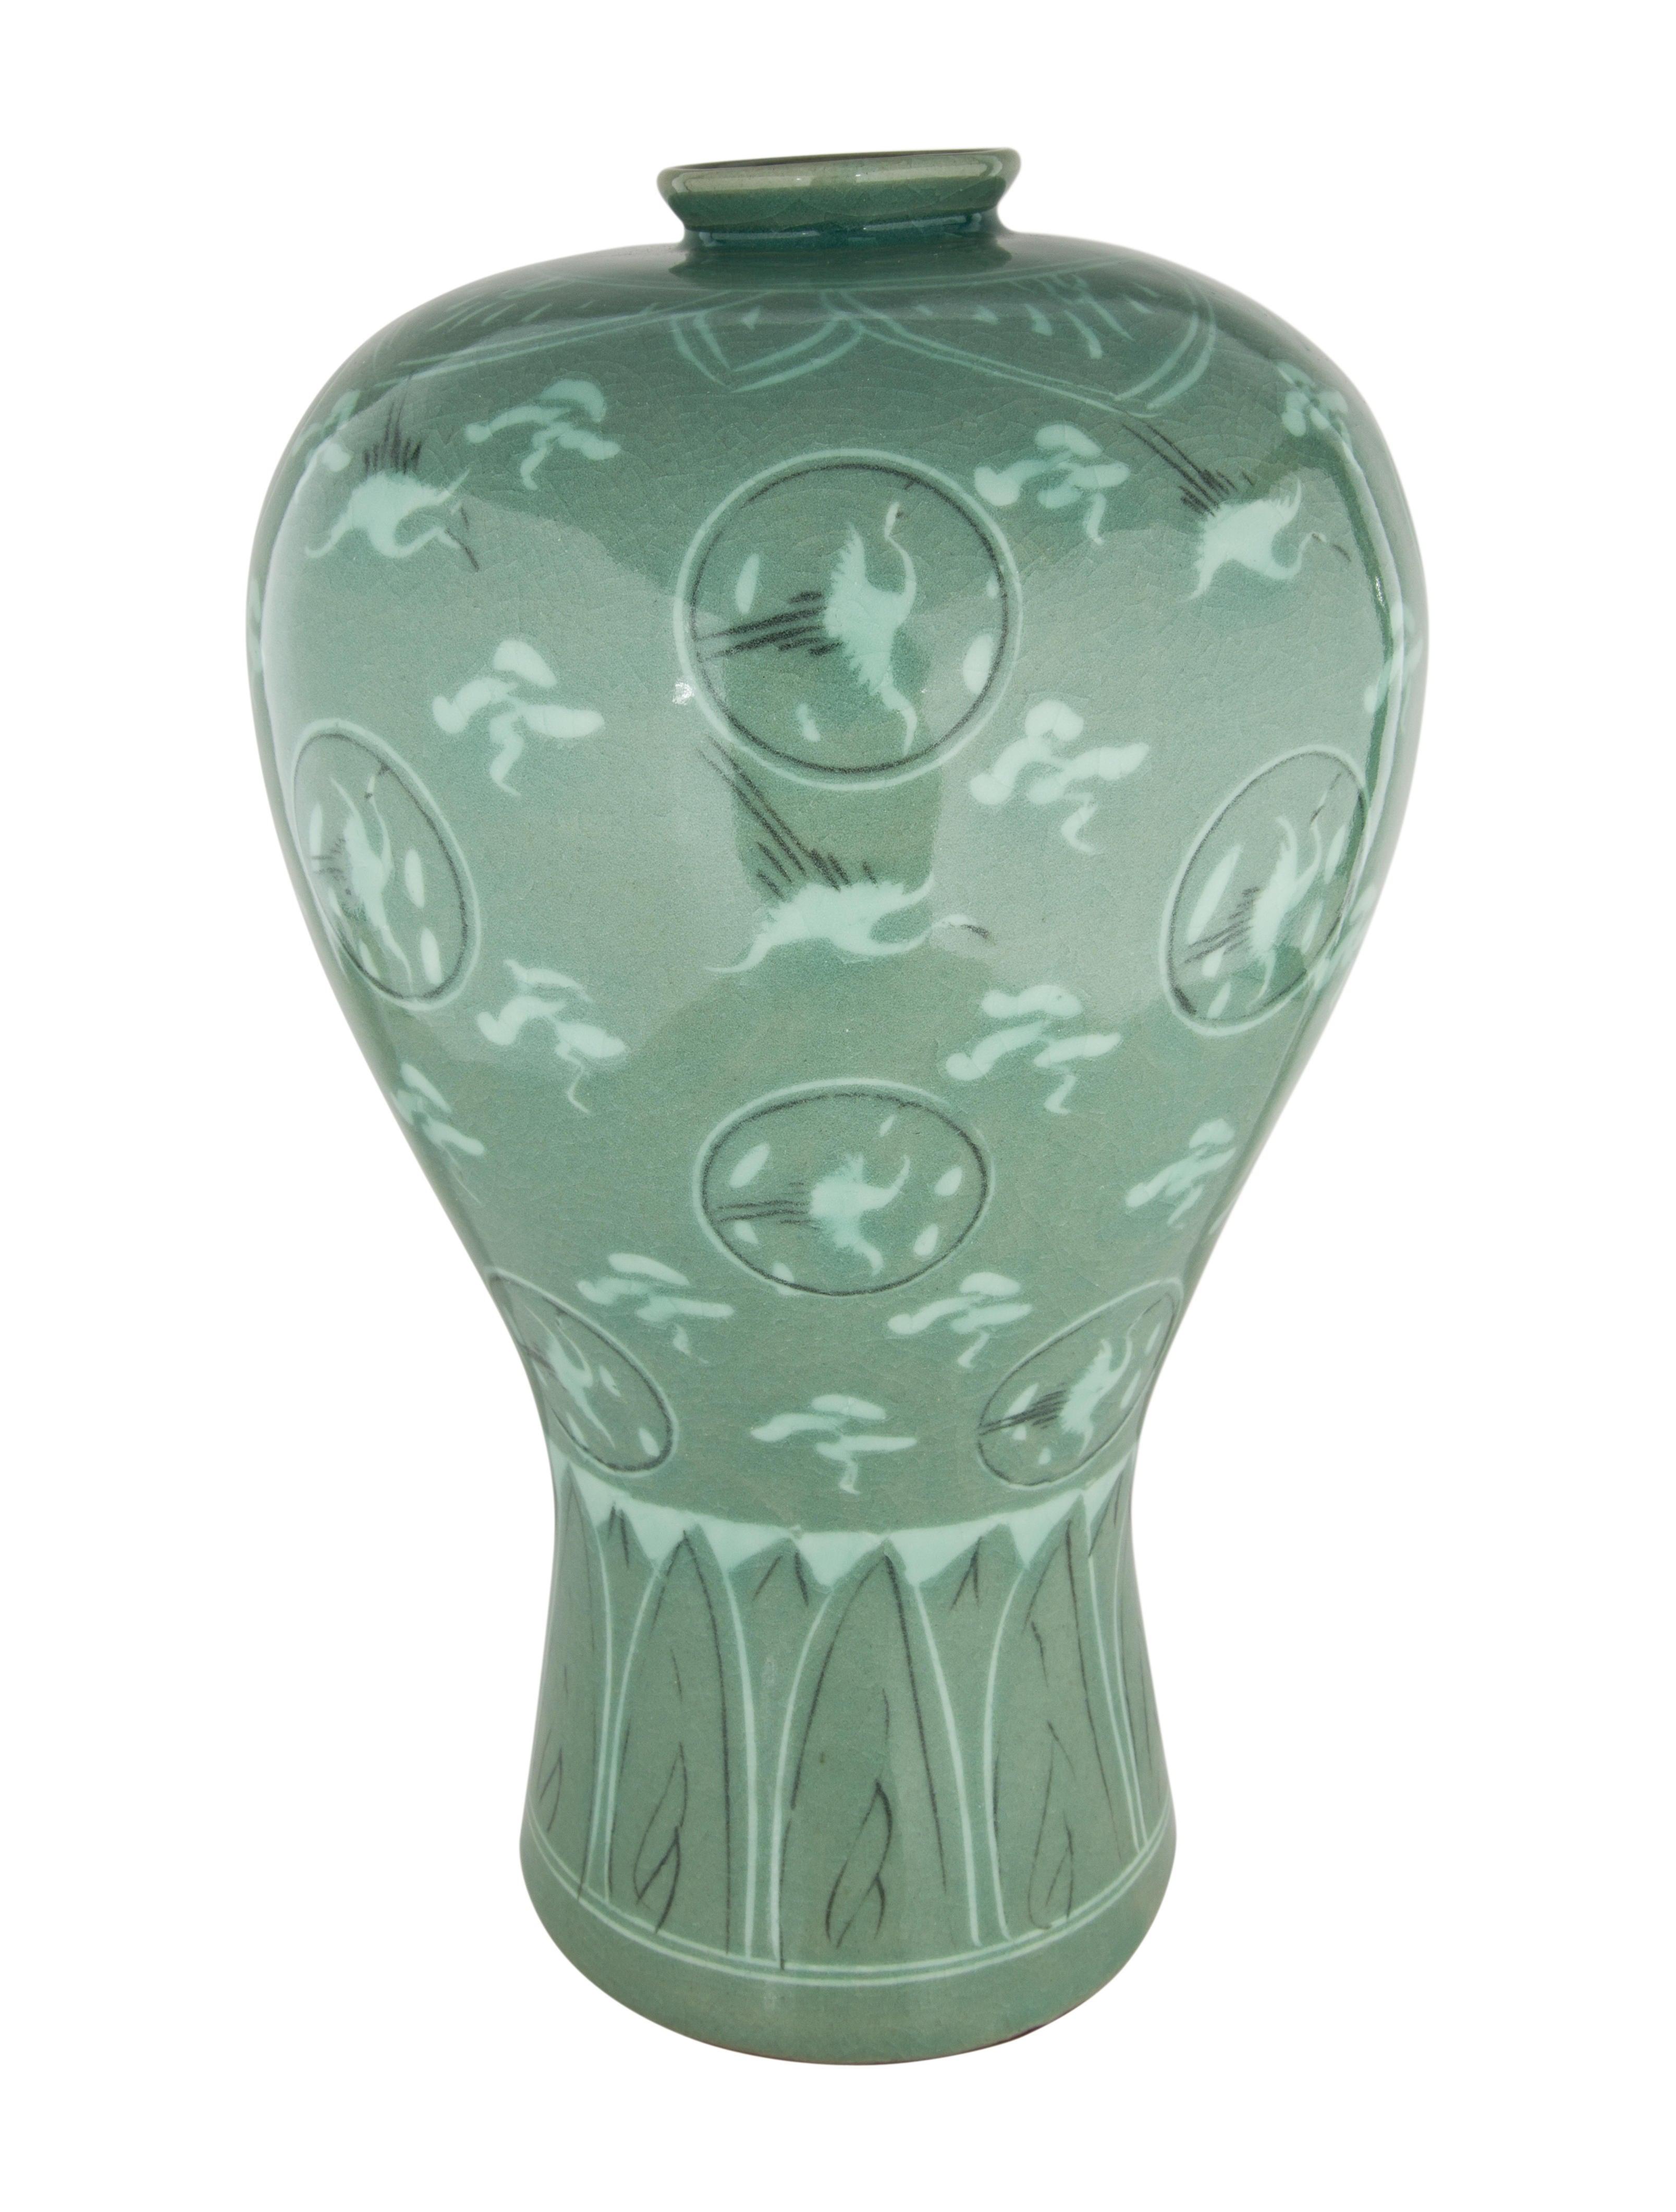 asian crane flower vase decor and accessories. Black Bedroom Furniture Sets. Home Design Ideas